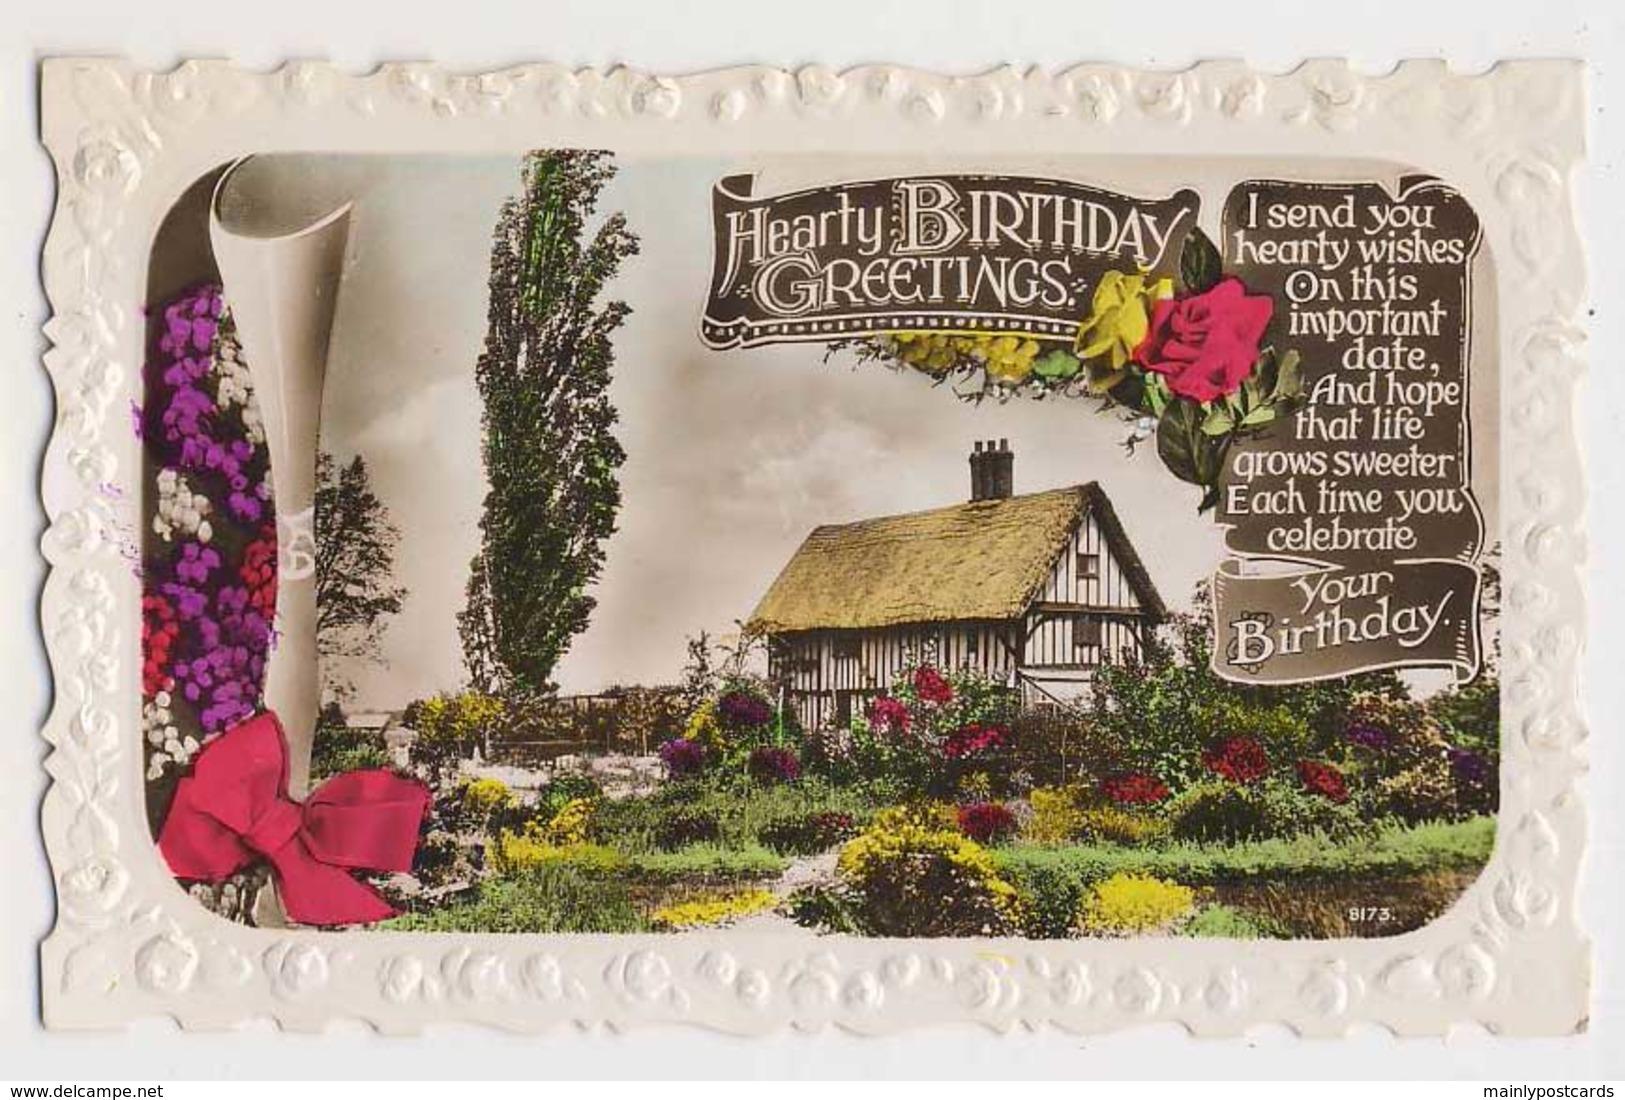 AI76 Greetings - Hearty Birthday Greetings - Cottage, Garden - Birthday